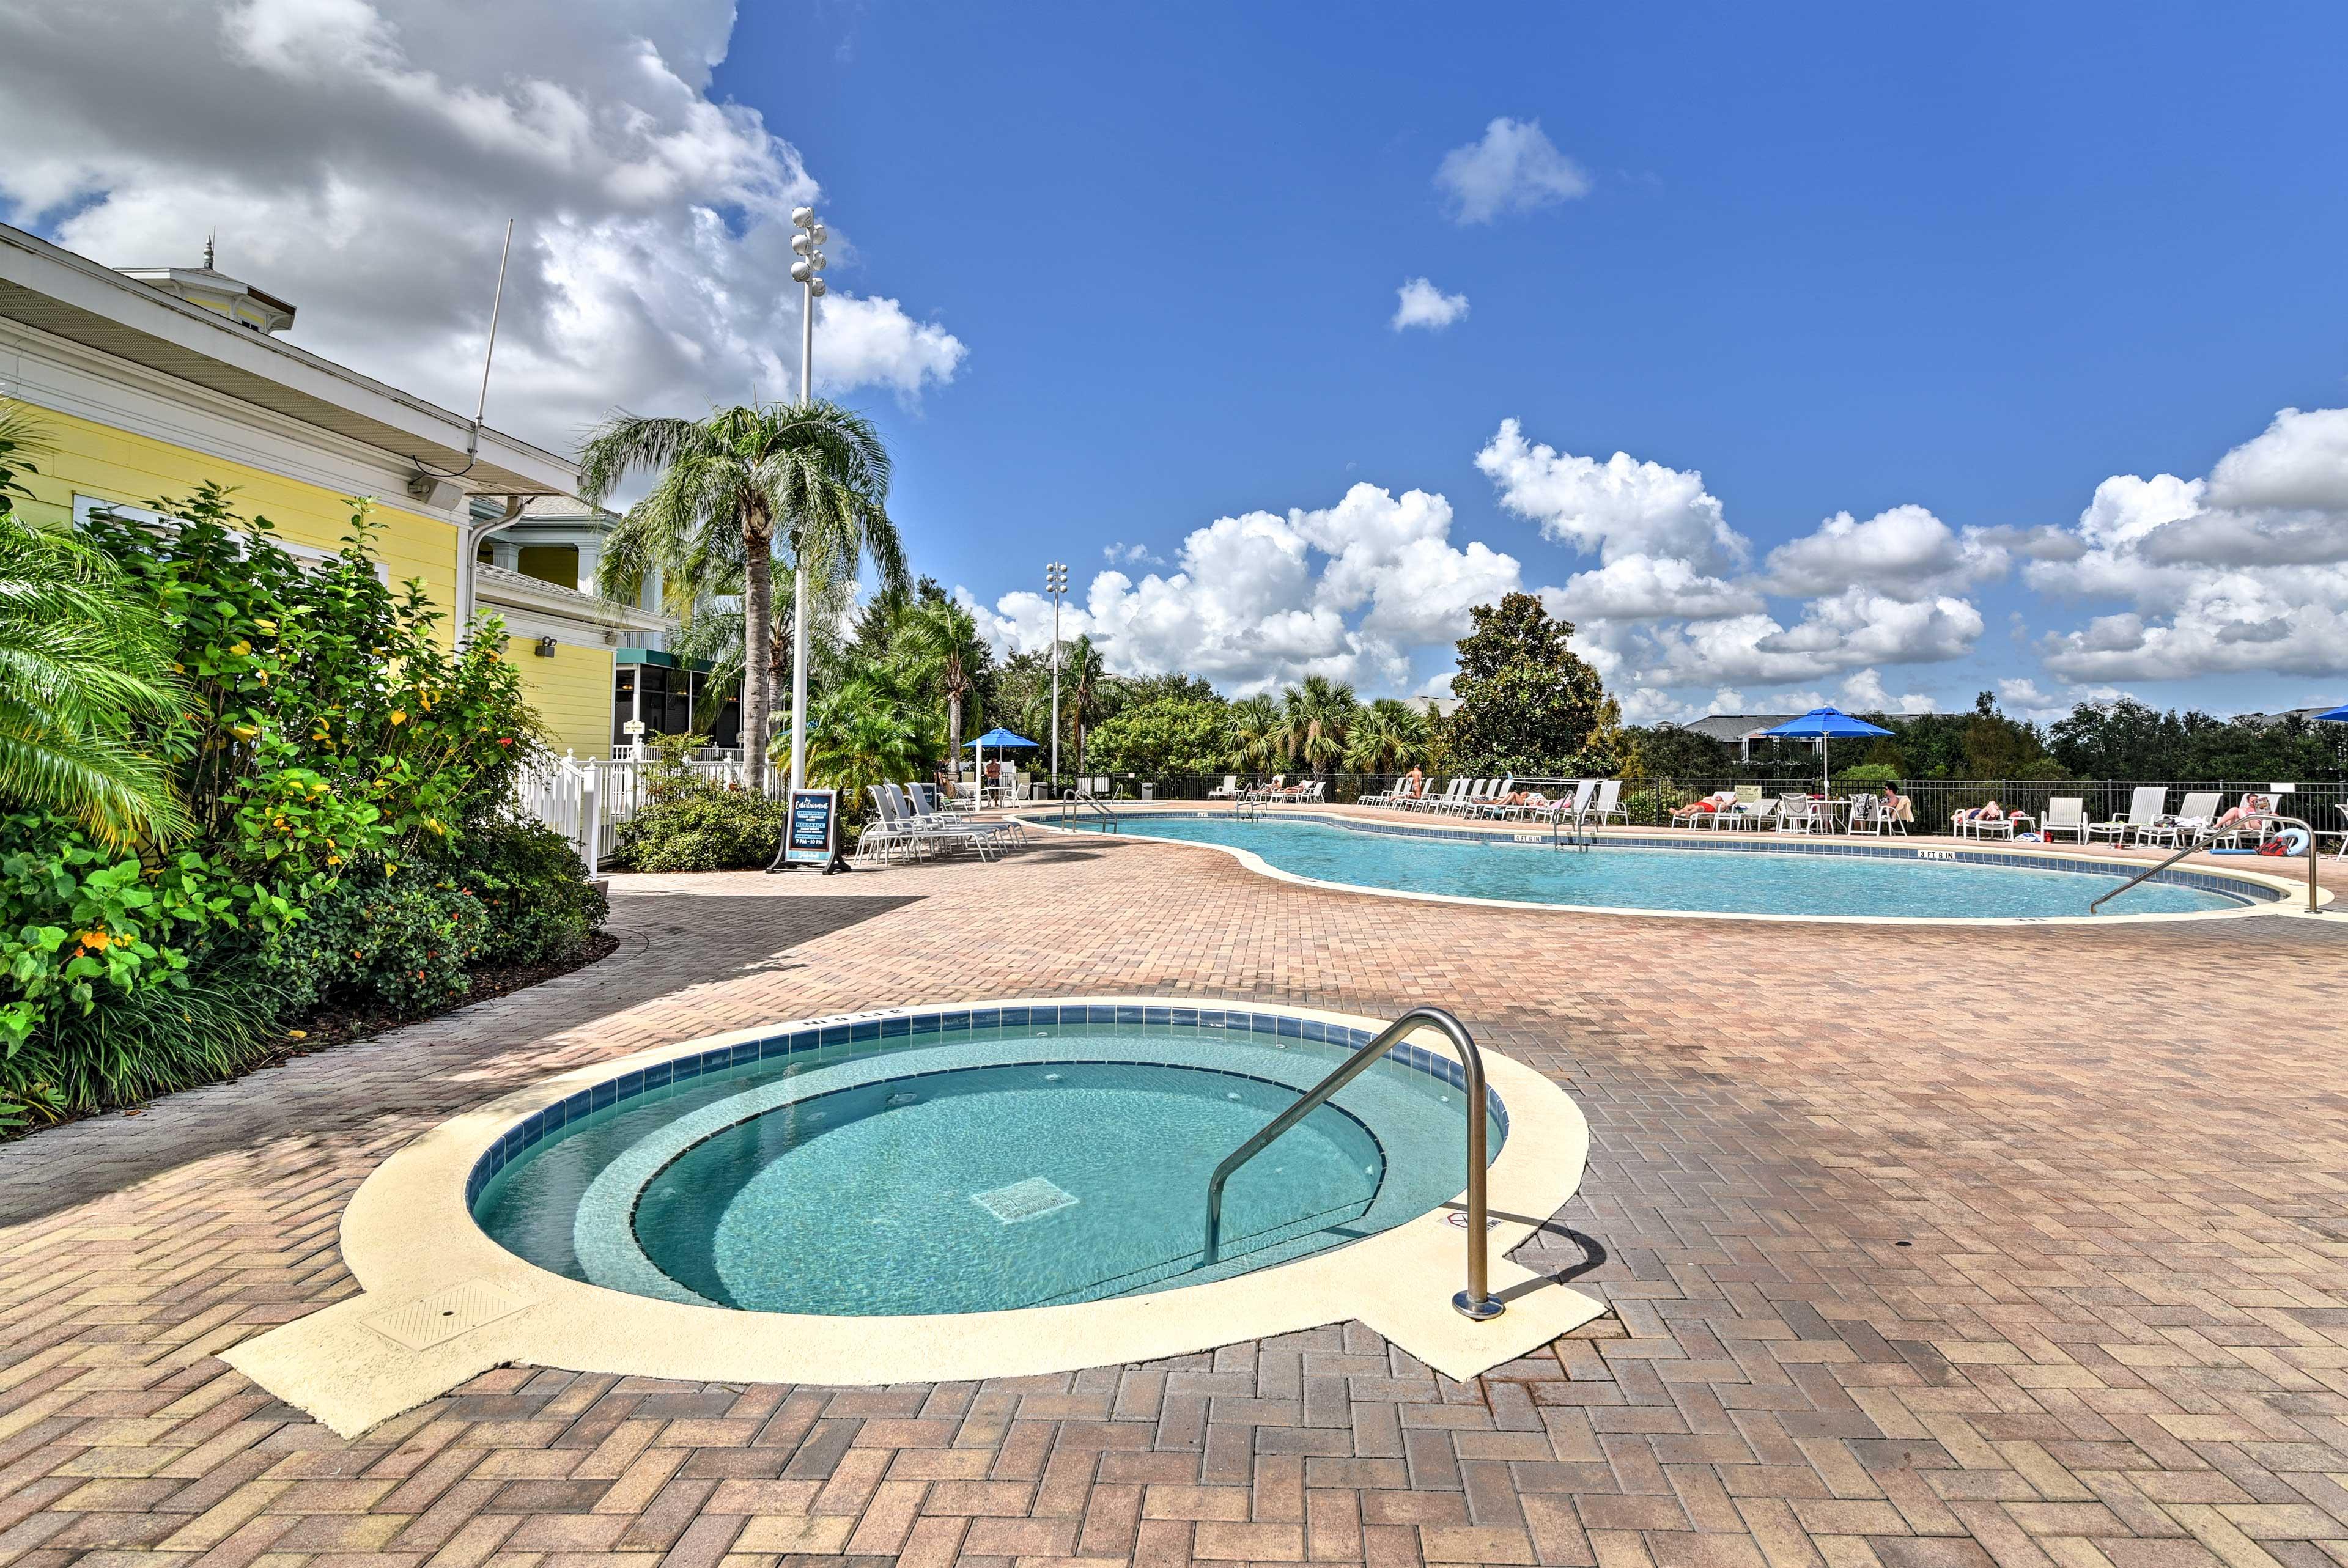 Community Pool & Hot Tub   Tons of Resort Amenities On-Site